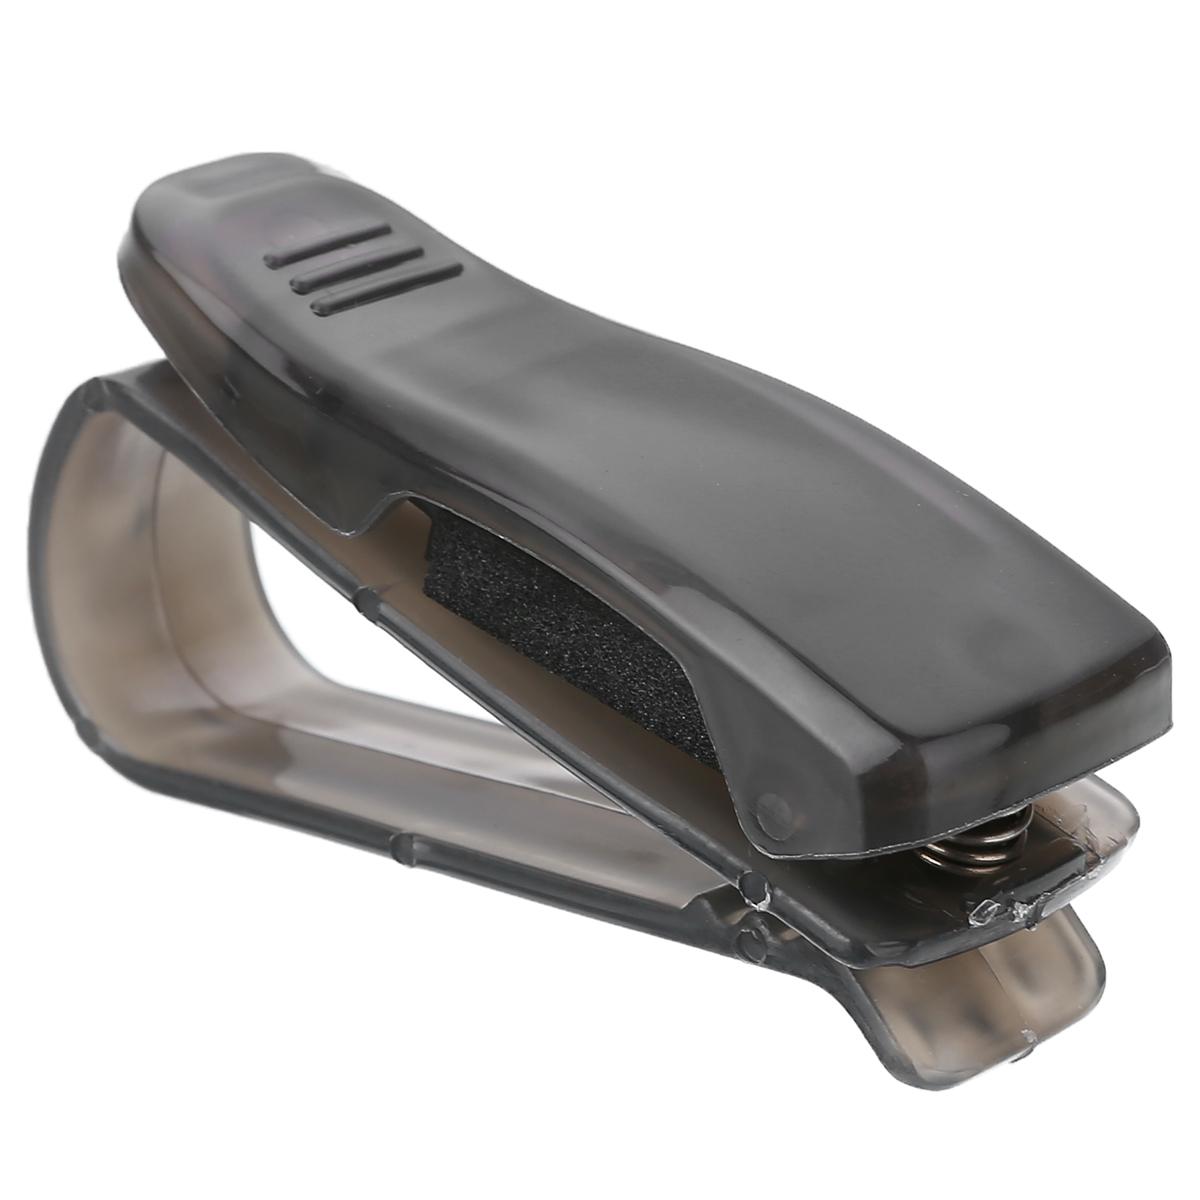 Hot Sale Car Fastener Clip Auto Accessories ABS Car Vehicle Sun Visor Sunglasses Eyeglasses Glasses Holder Ticket Clip